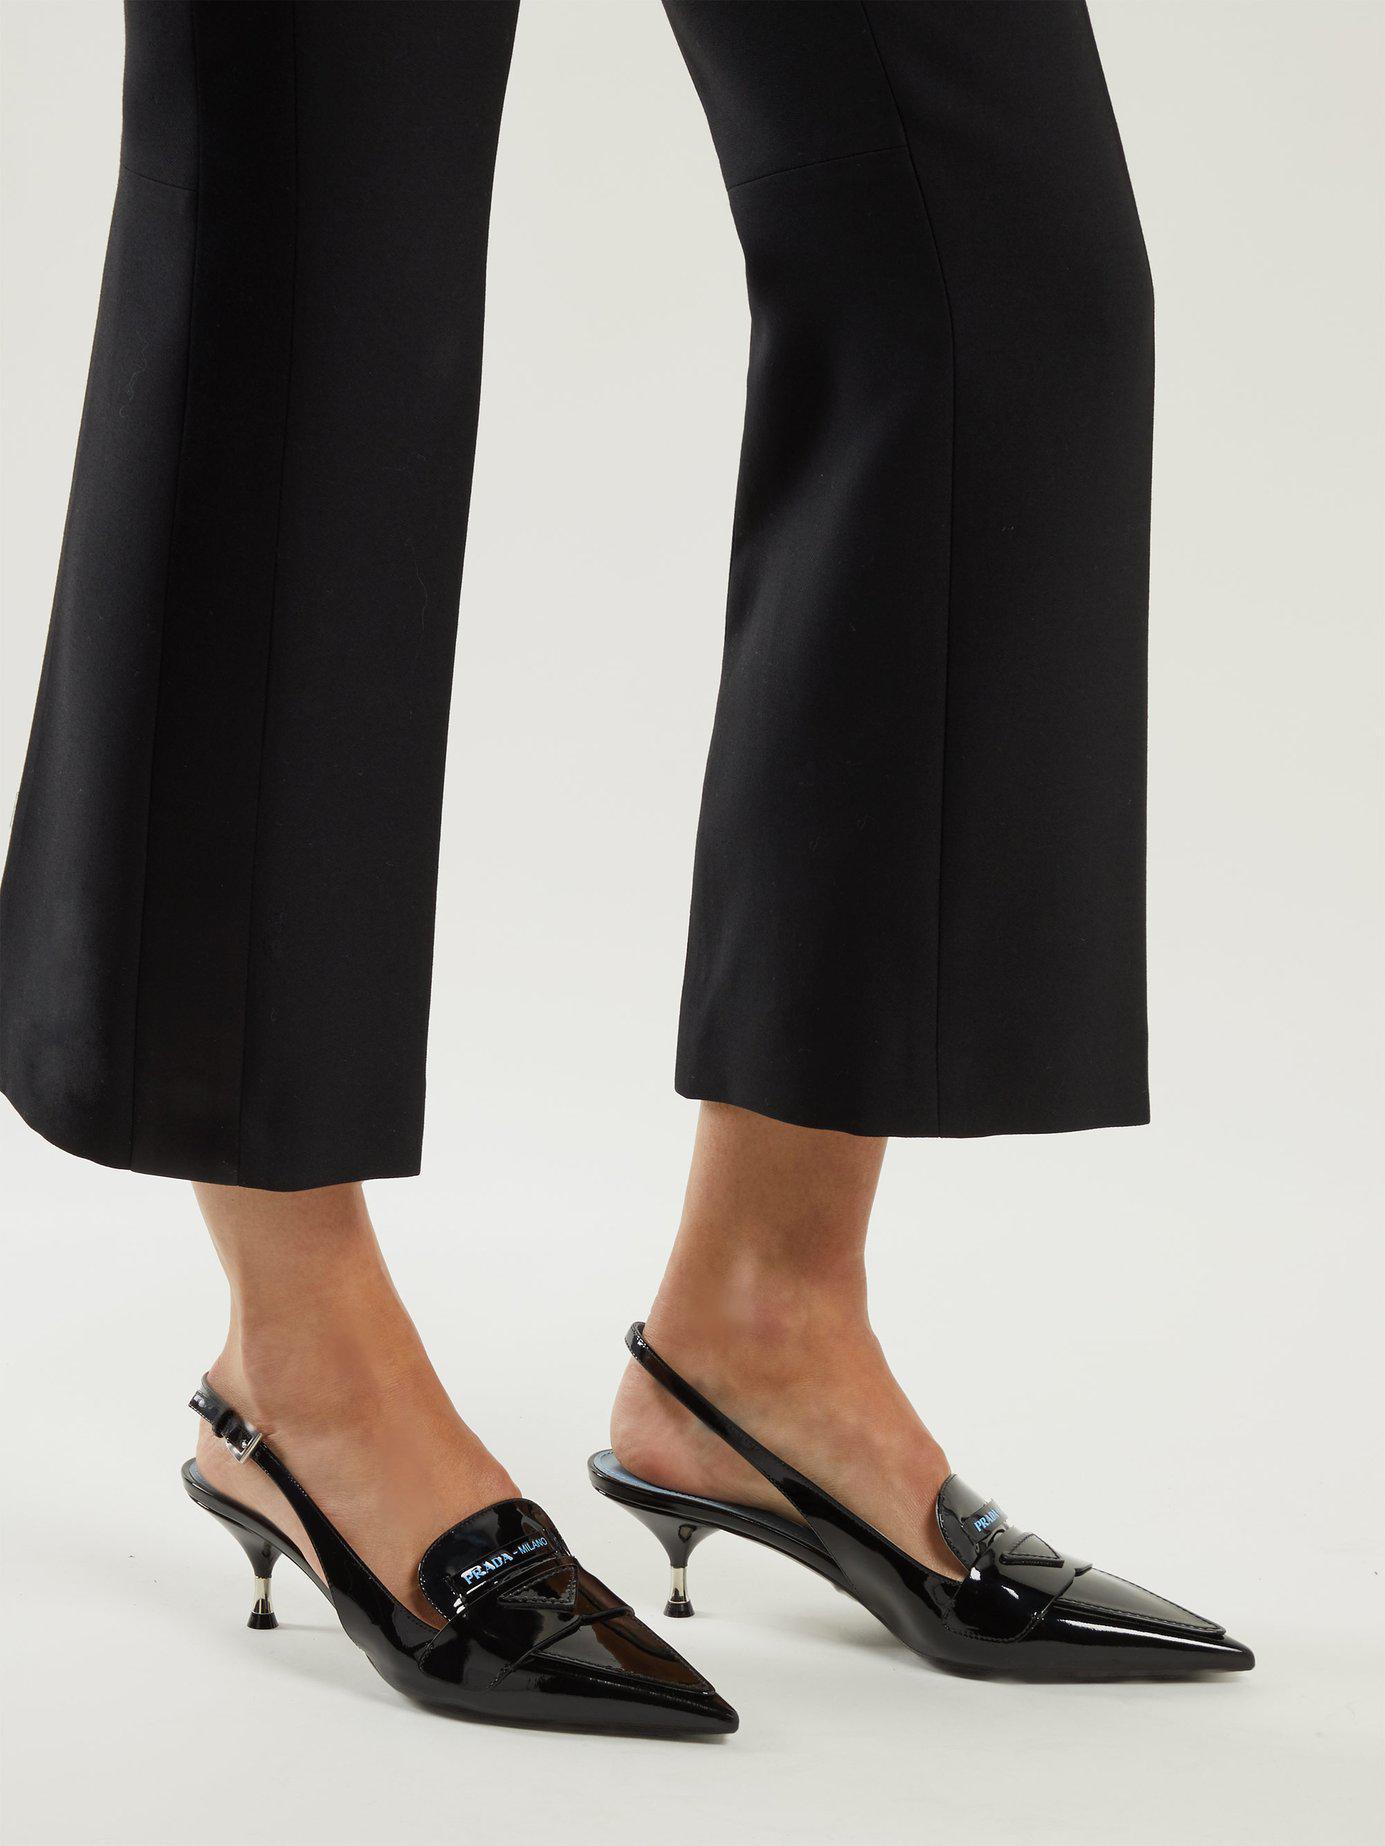 c499040f0ff Lyst - Prada Logo-embellished Kitten-heel Patent-leather Pumps in Black